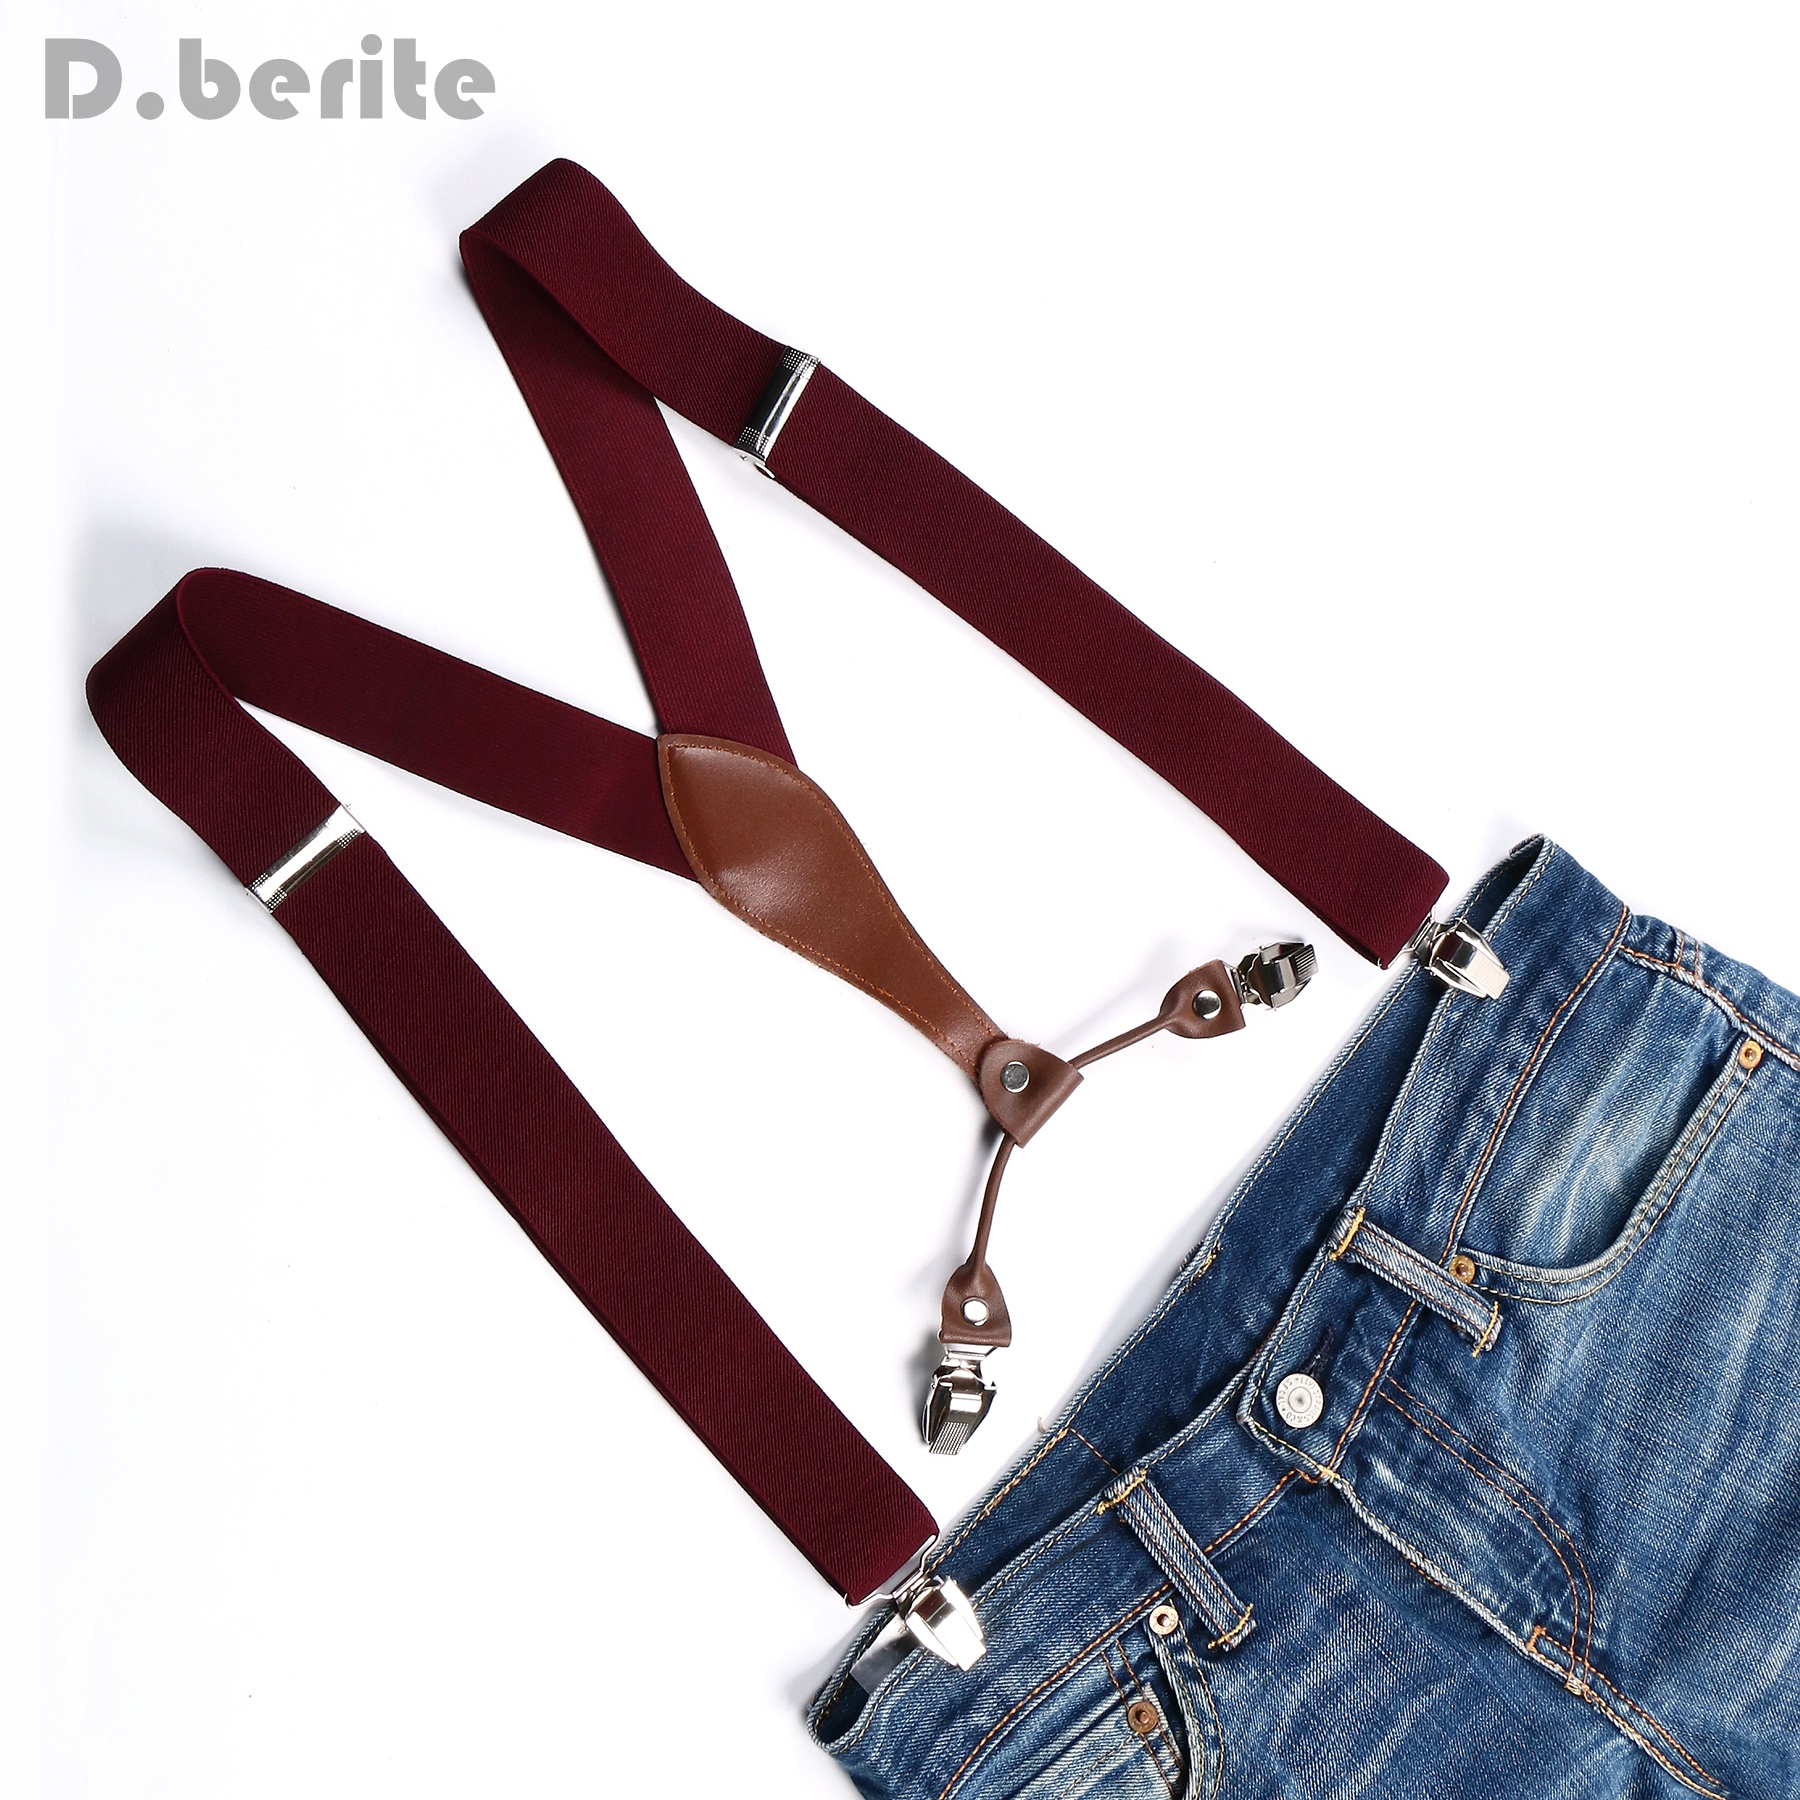 Men's Suspender Women Braces Unisex Adjustable Metal Clip-on Solid Cameo Brown BD604